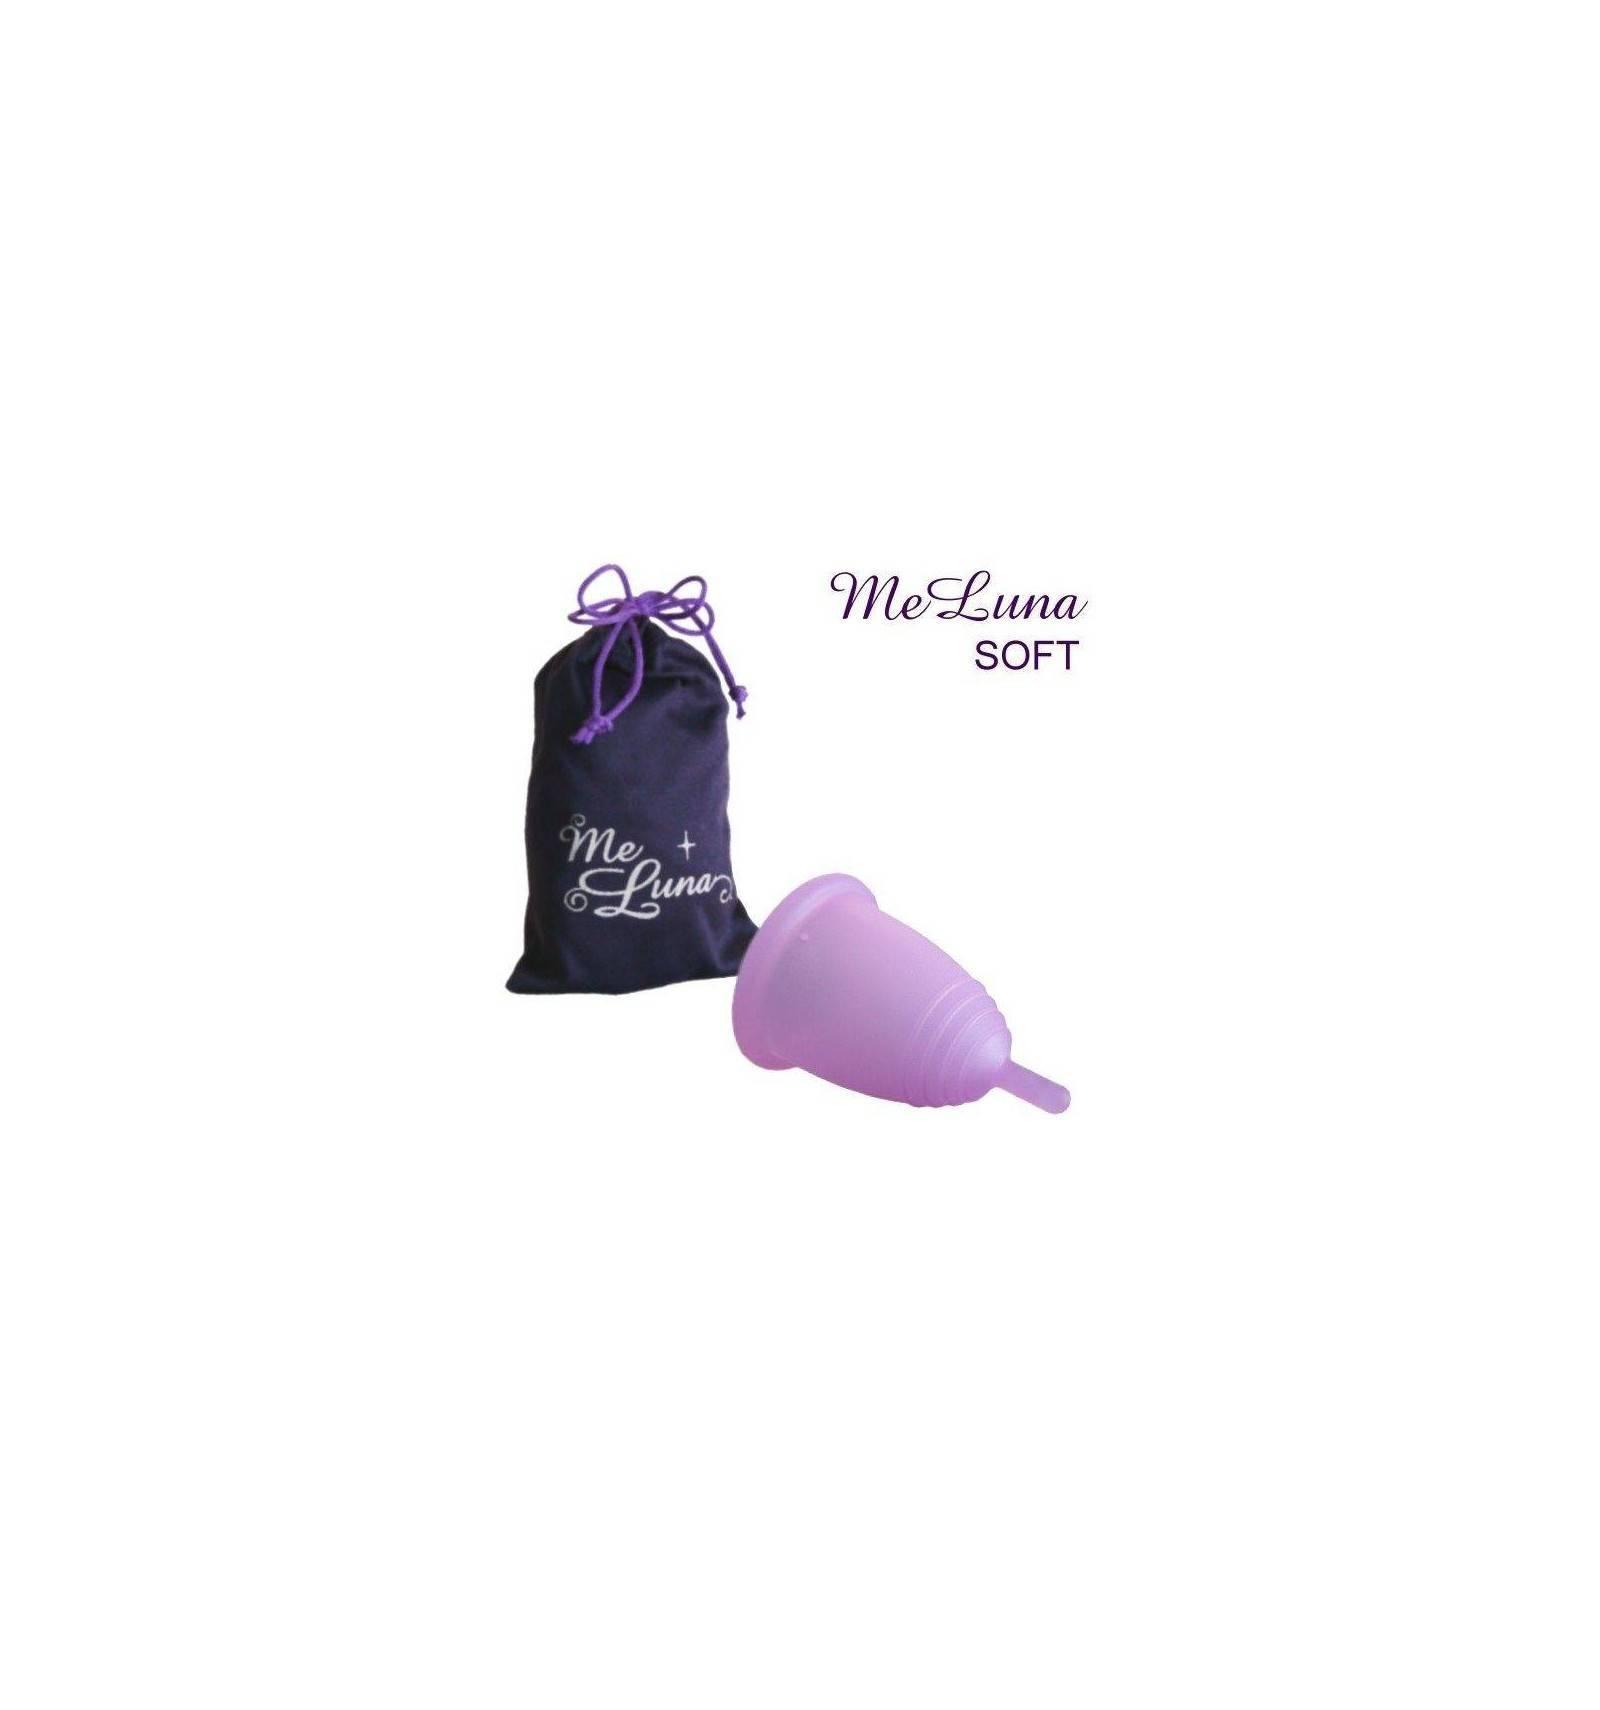 Copa menstrual Meluna Soft, Pezón